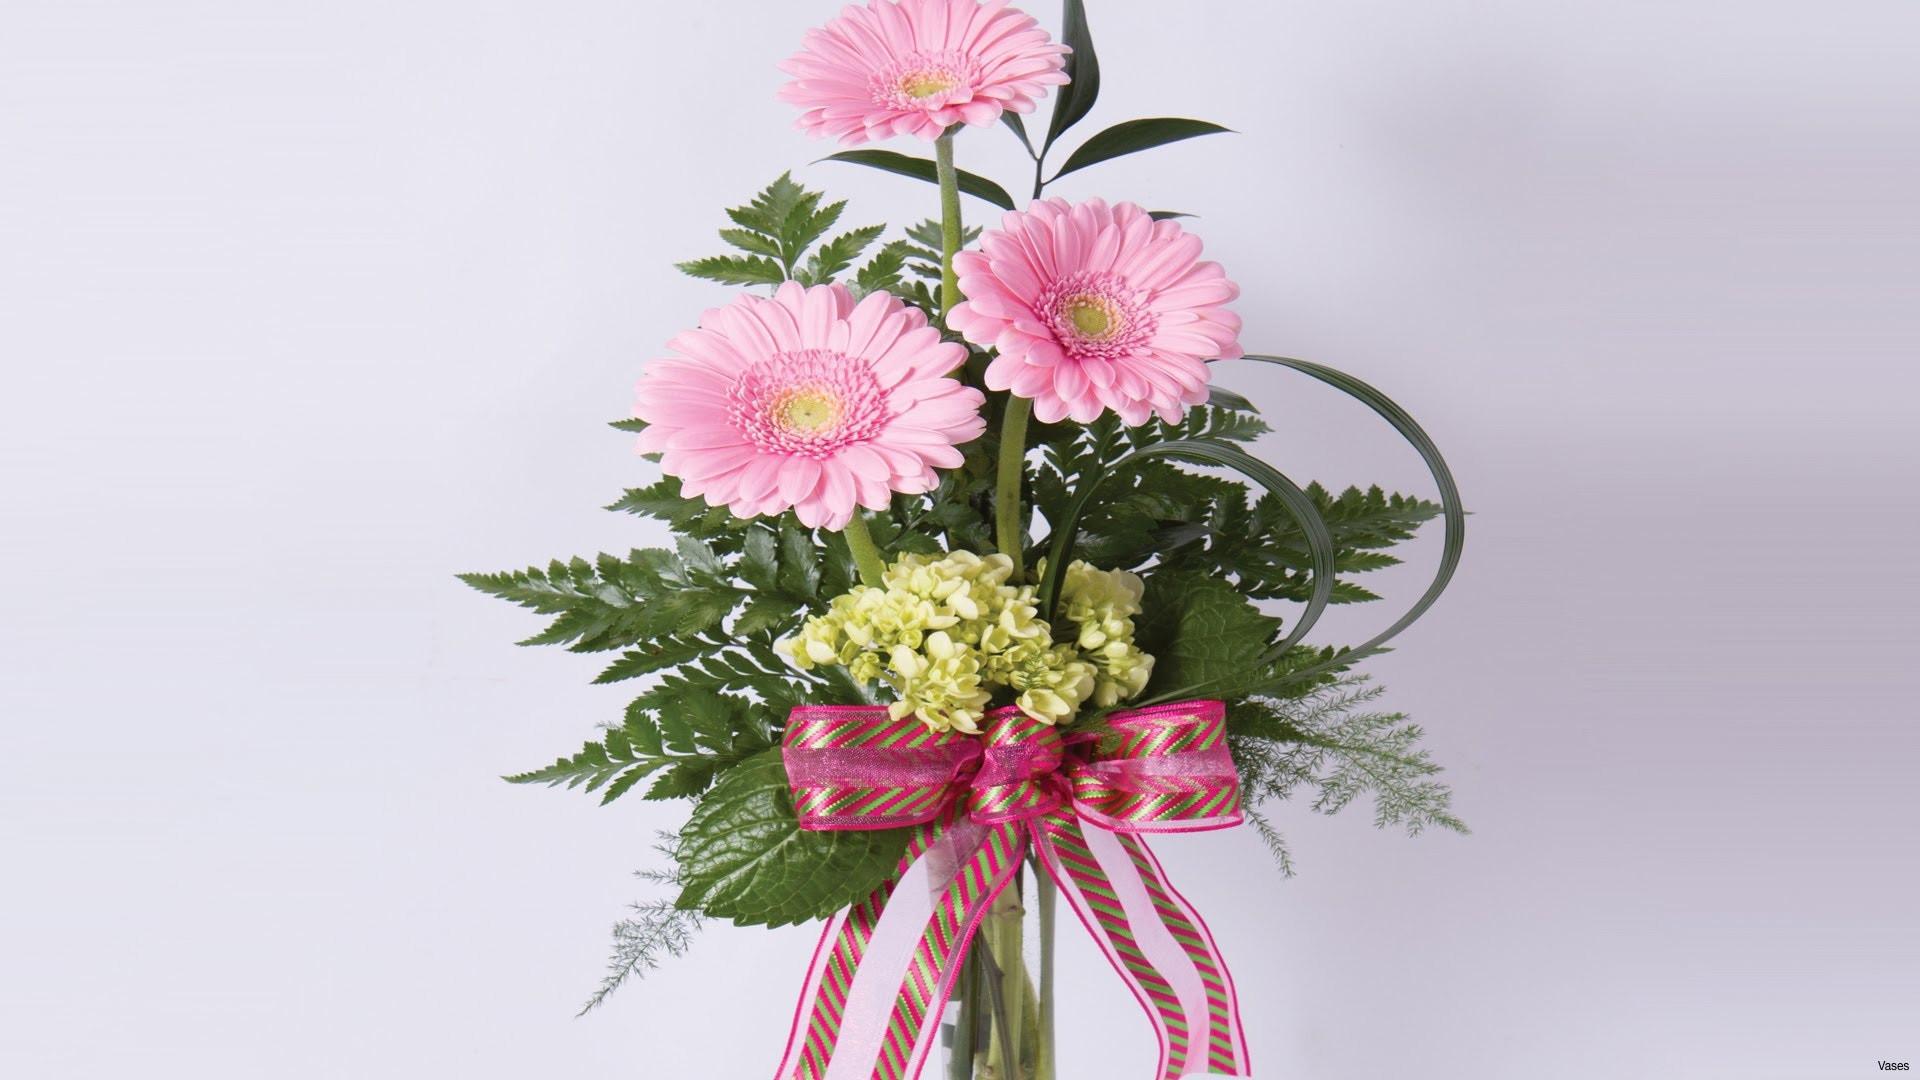 h vases bud vase flower arrangements i 0d for inspiration design design ideas of daisy flower arrangements of daisy flower arrangements